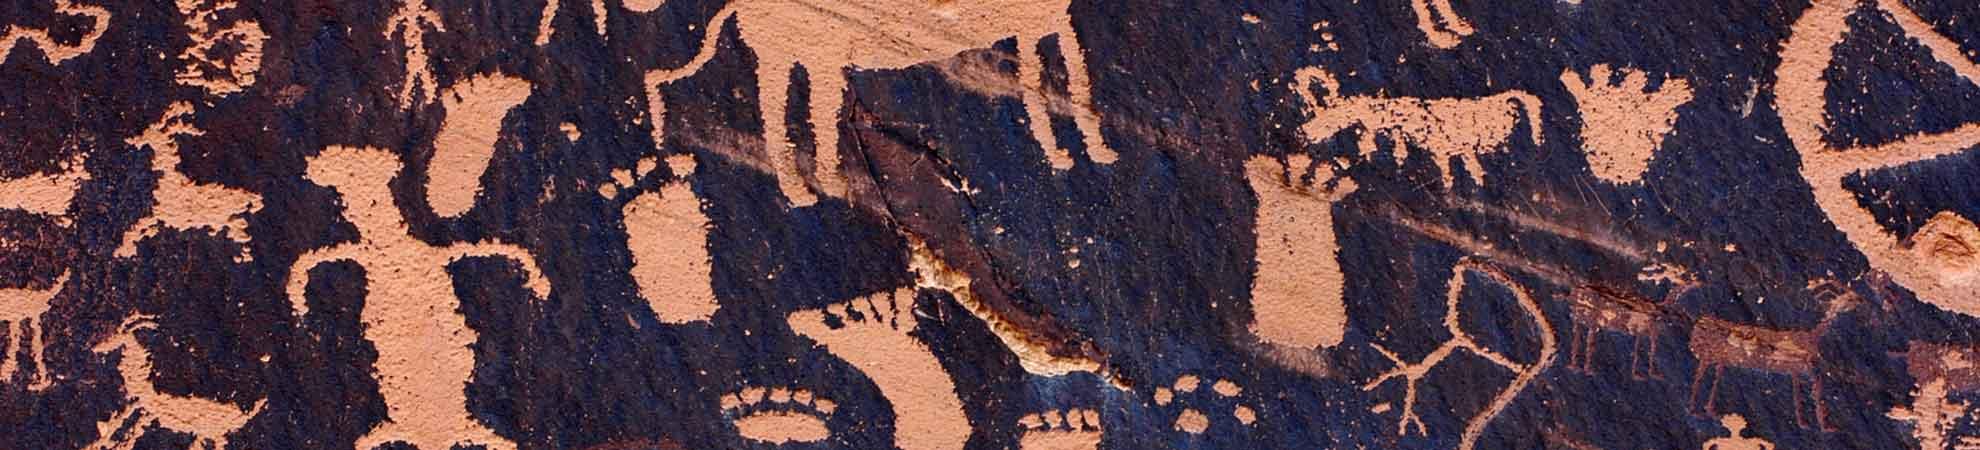 Rencontre avec les Indiens Navajos